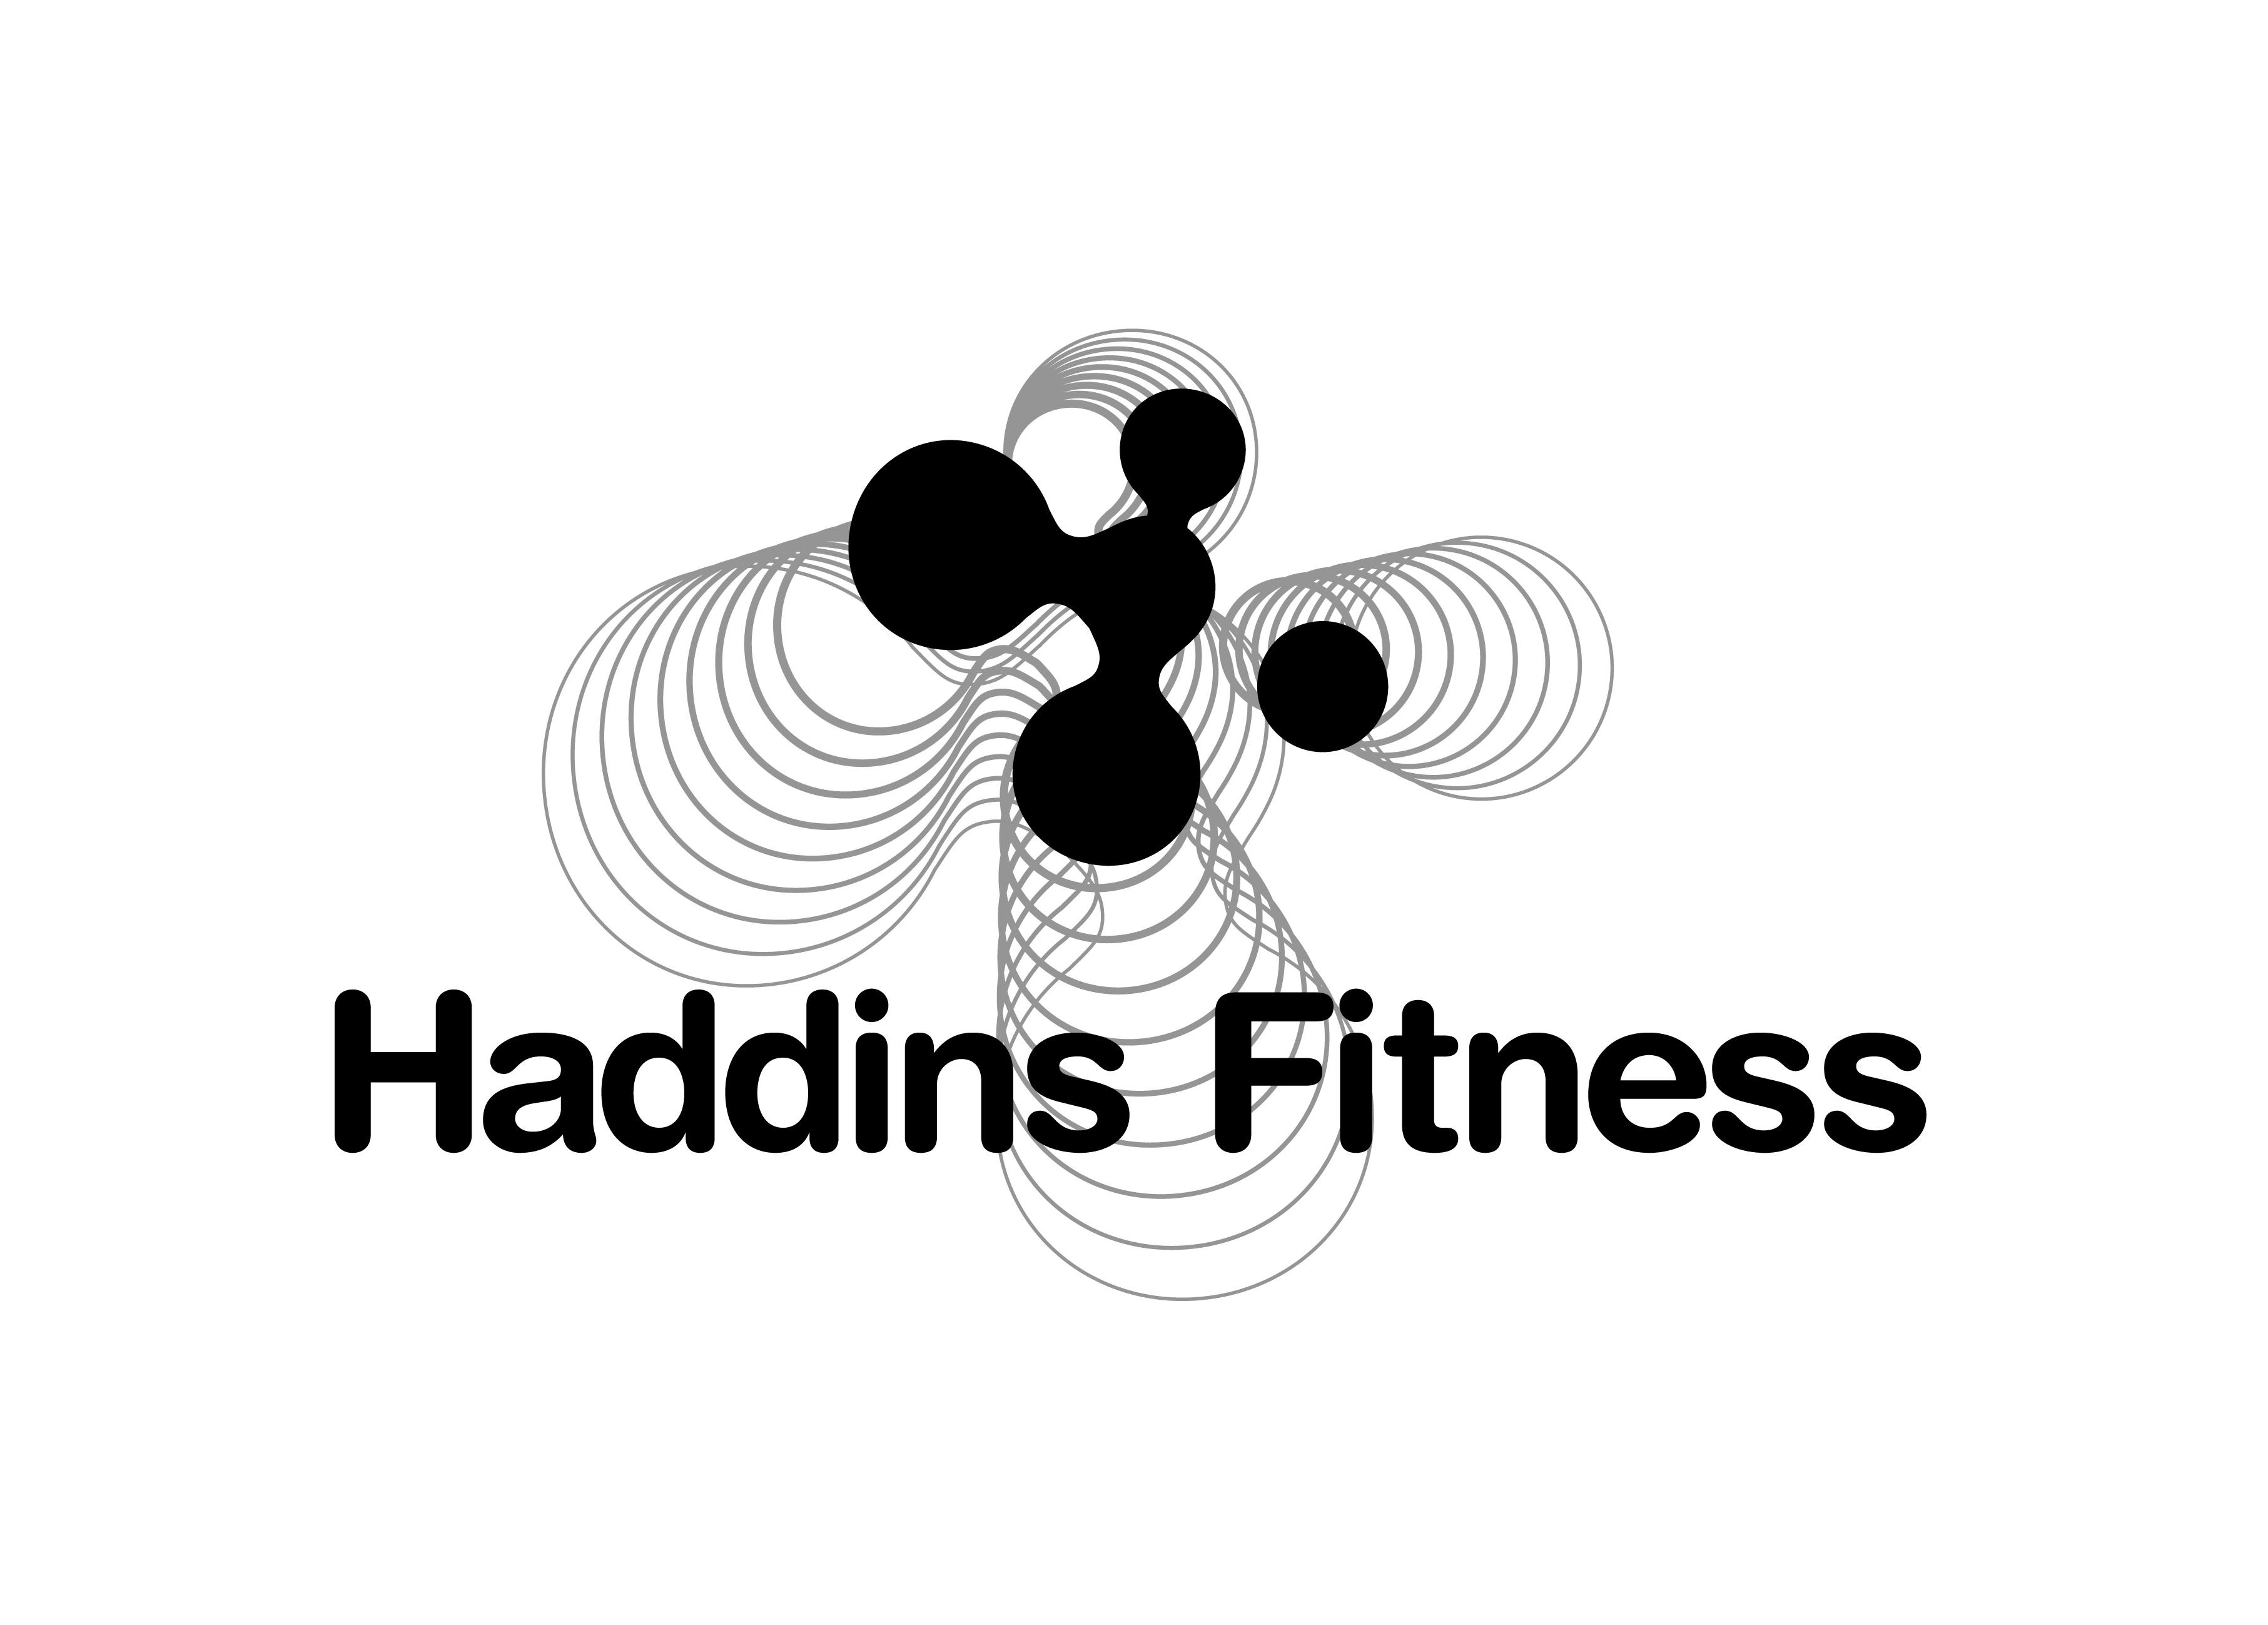 Haddins Fitness